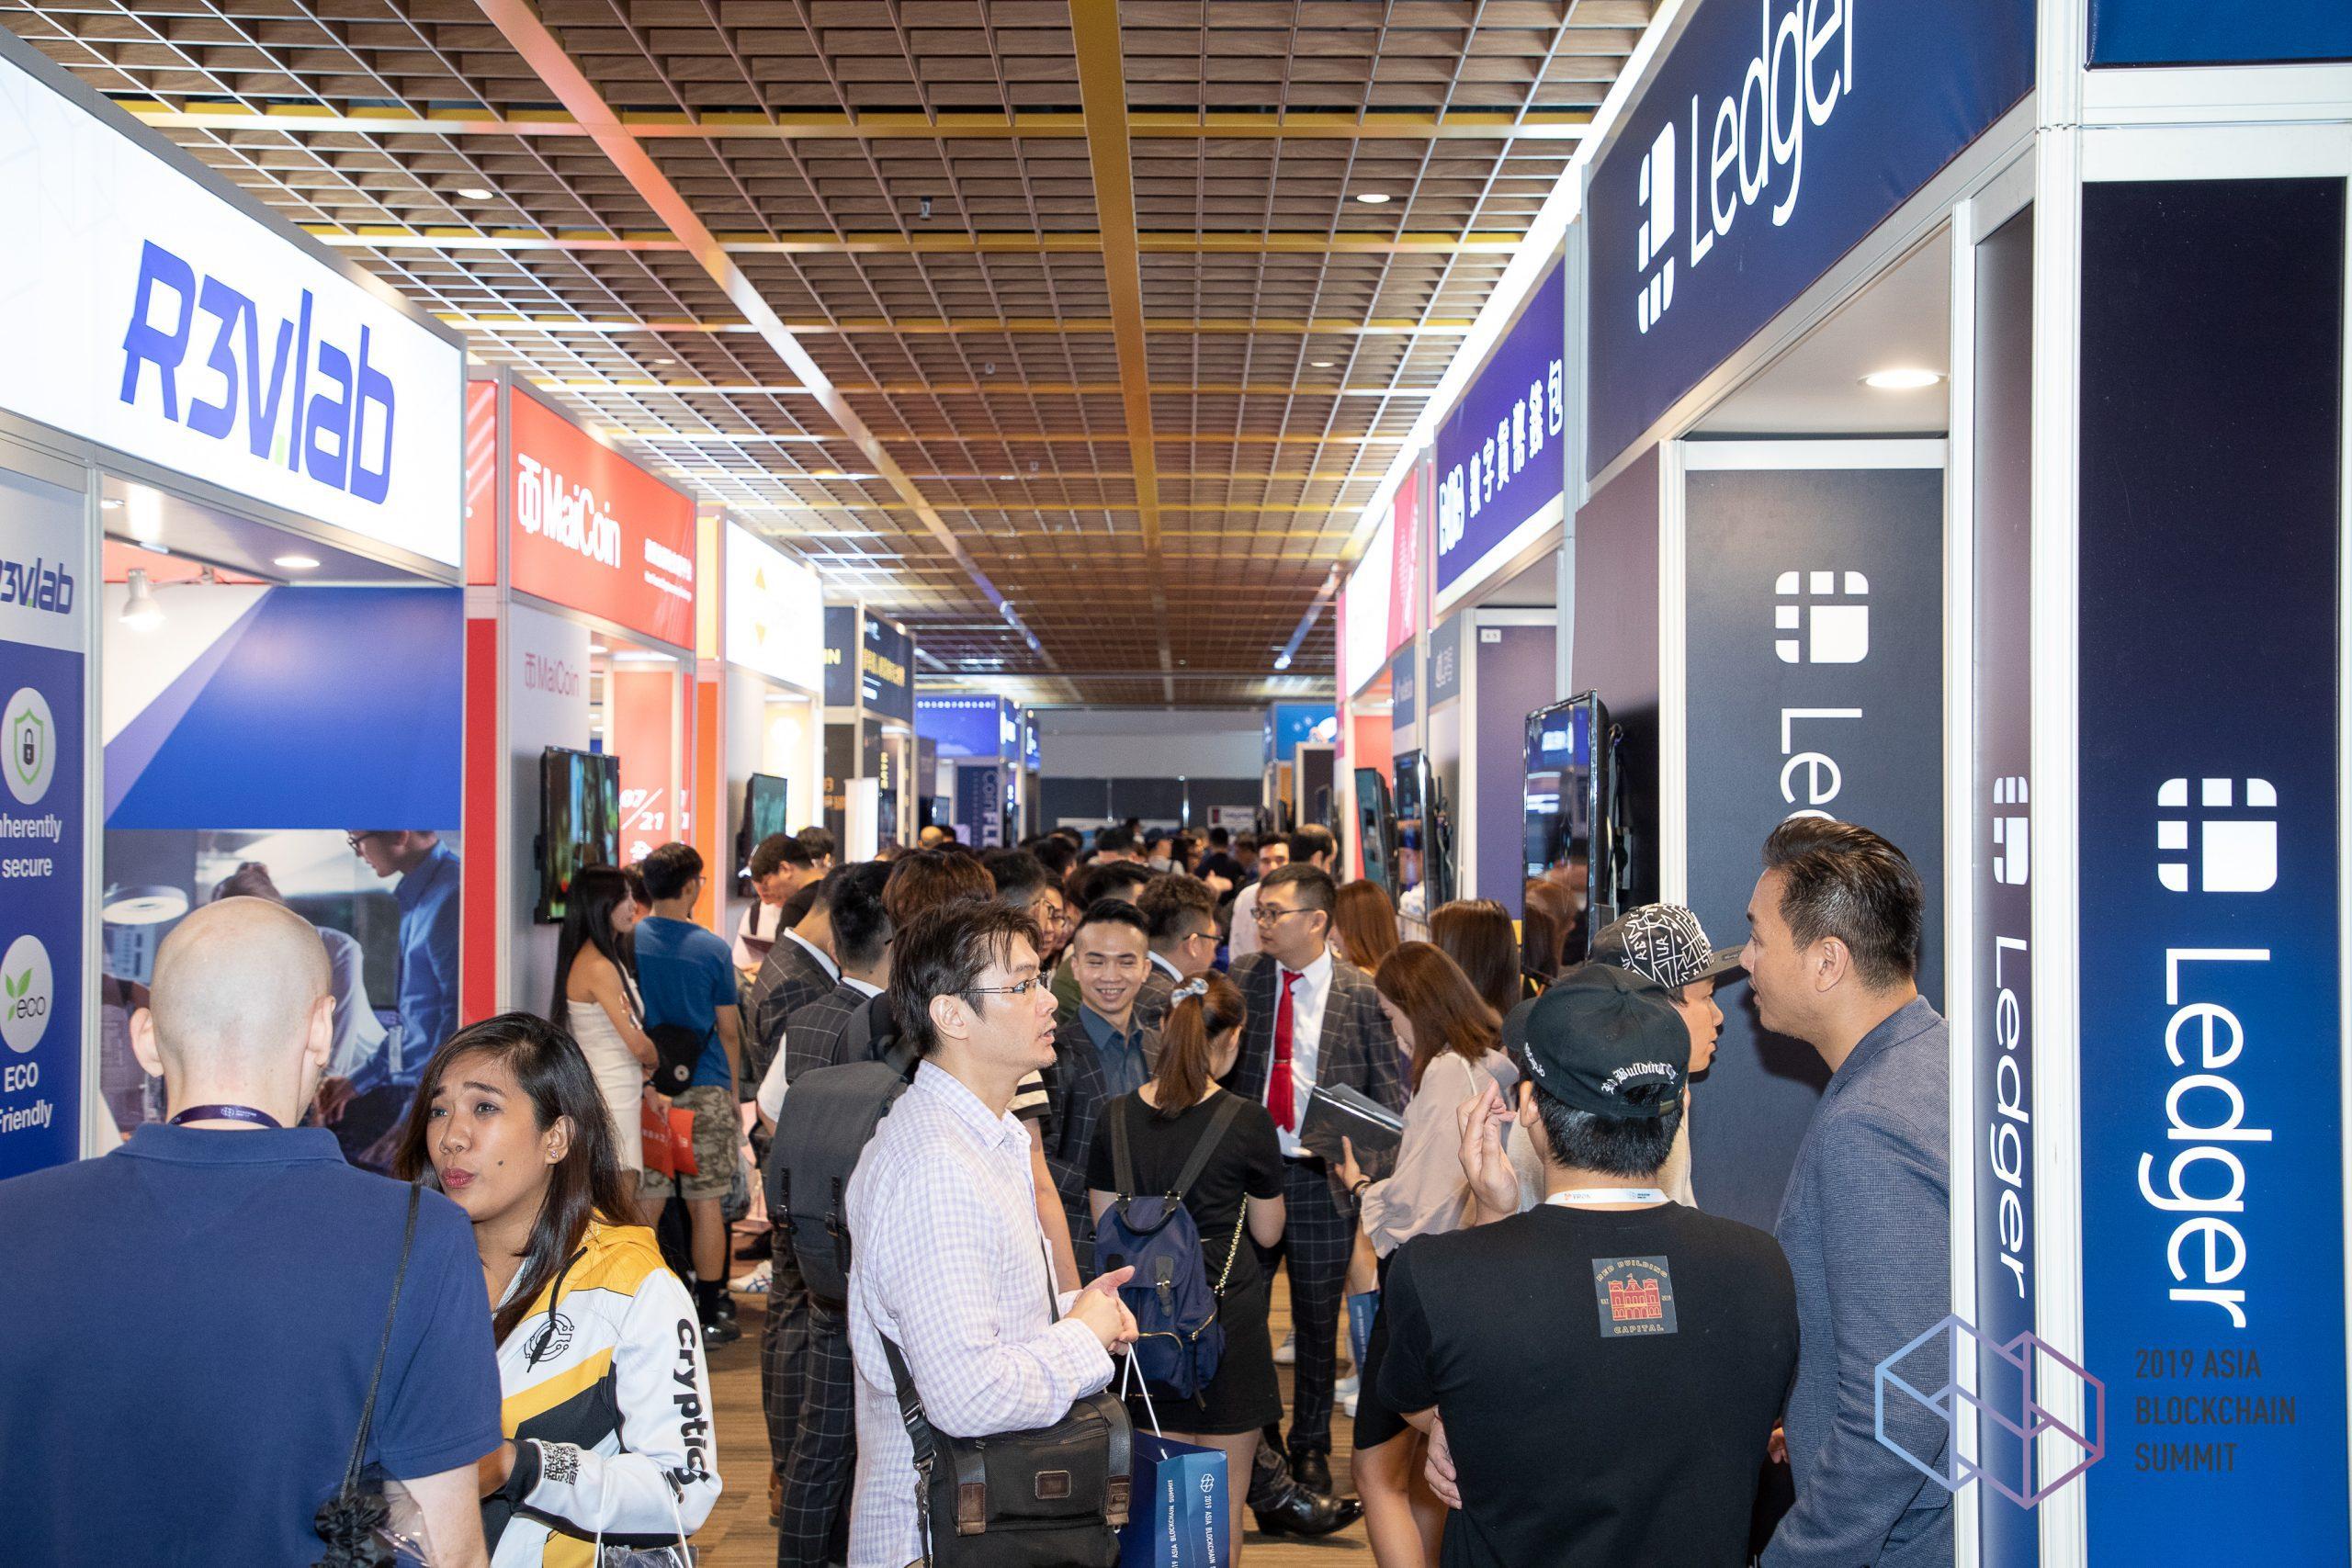 web-summit-2018-opening-ceremony-3